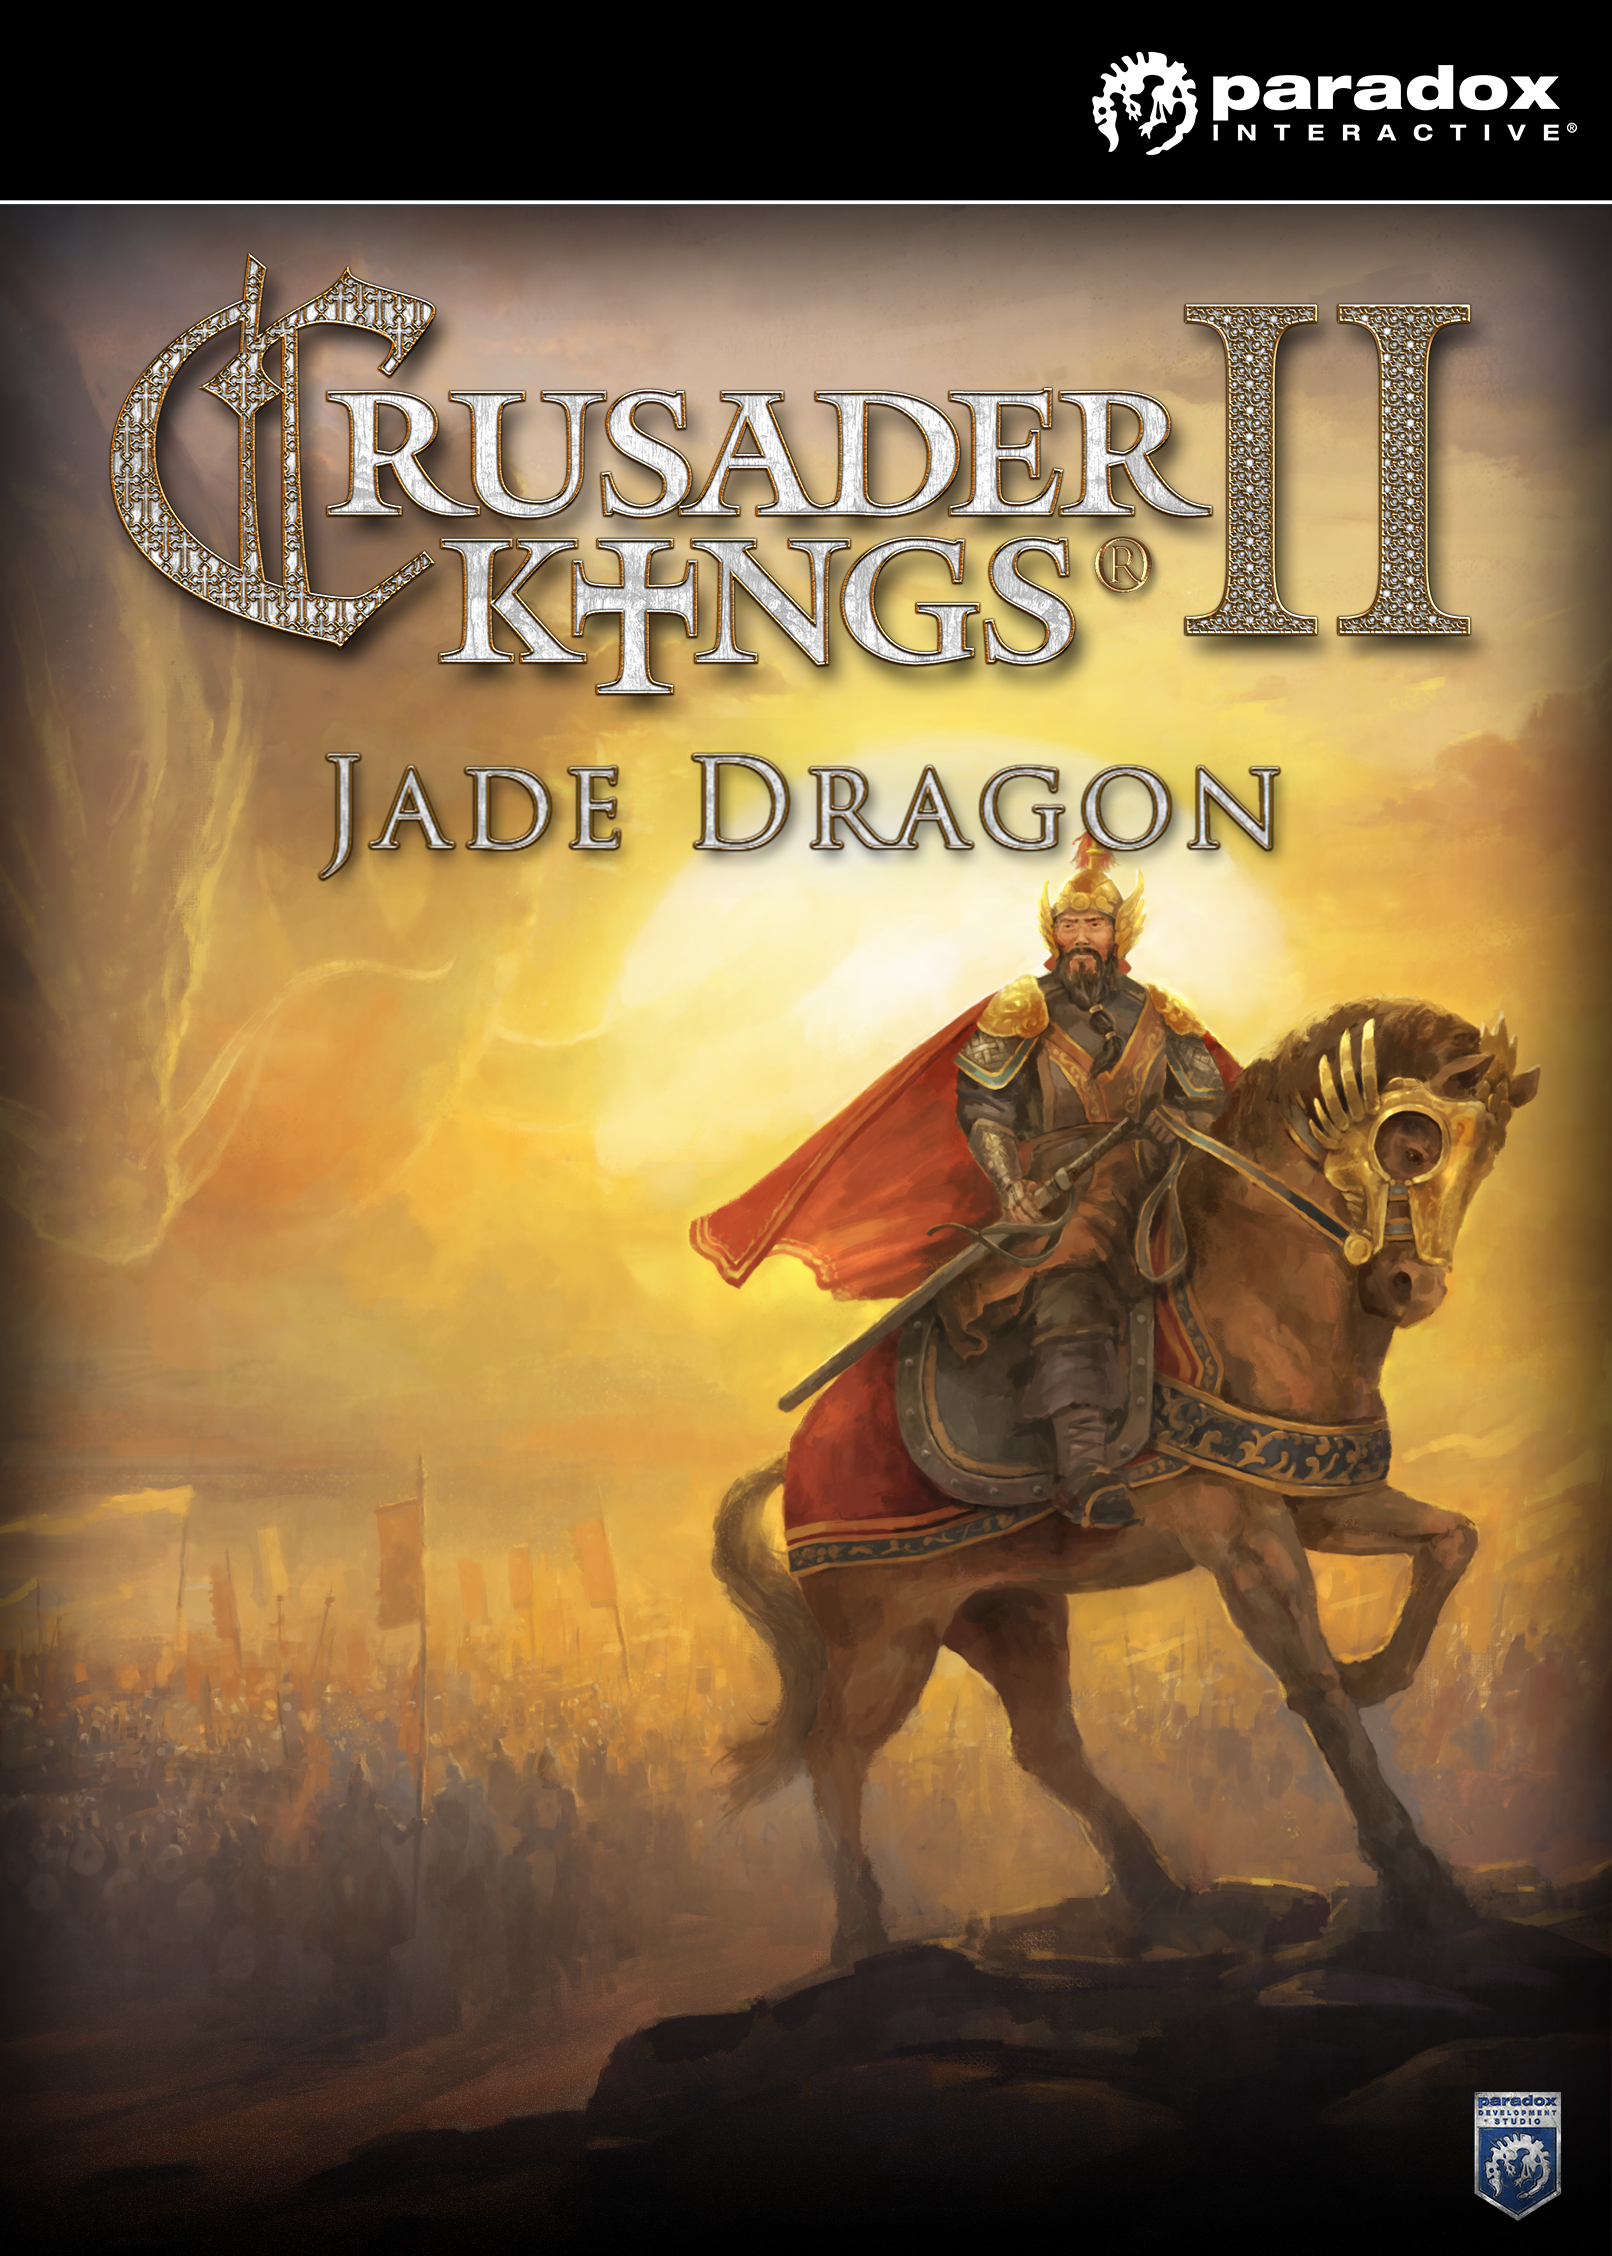 Crusader Kings II: Jade Dragon [PC/Mac Code - Steam]